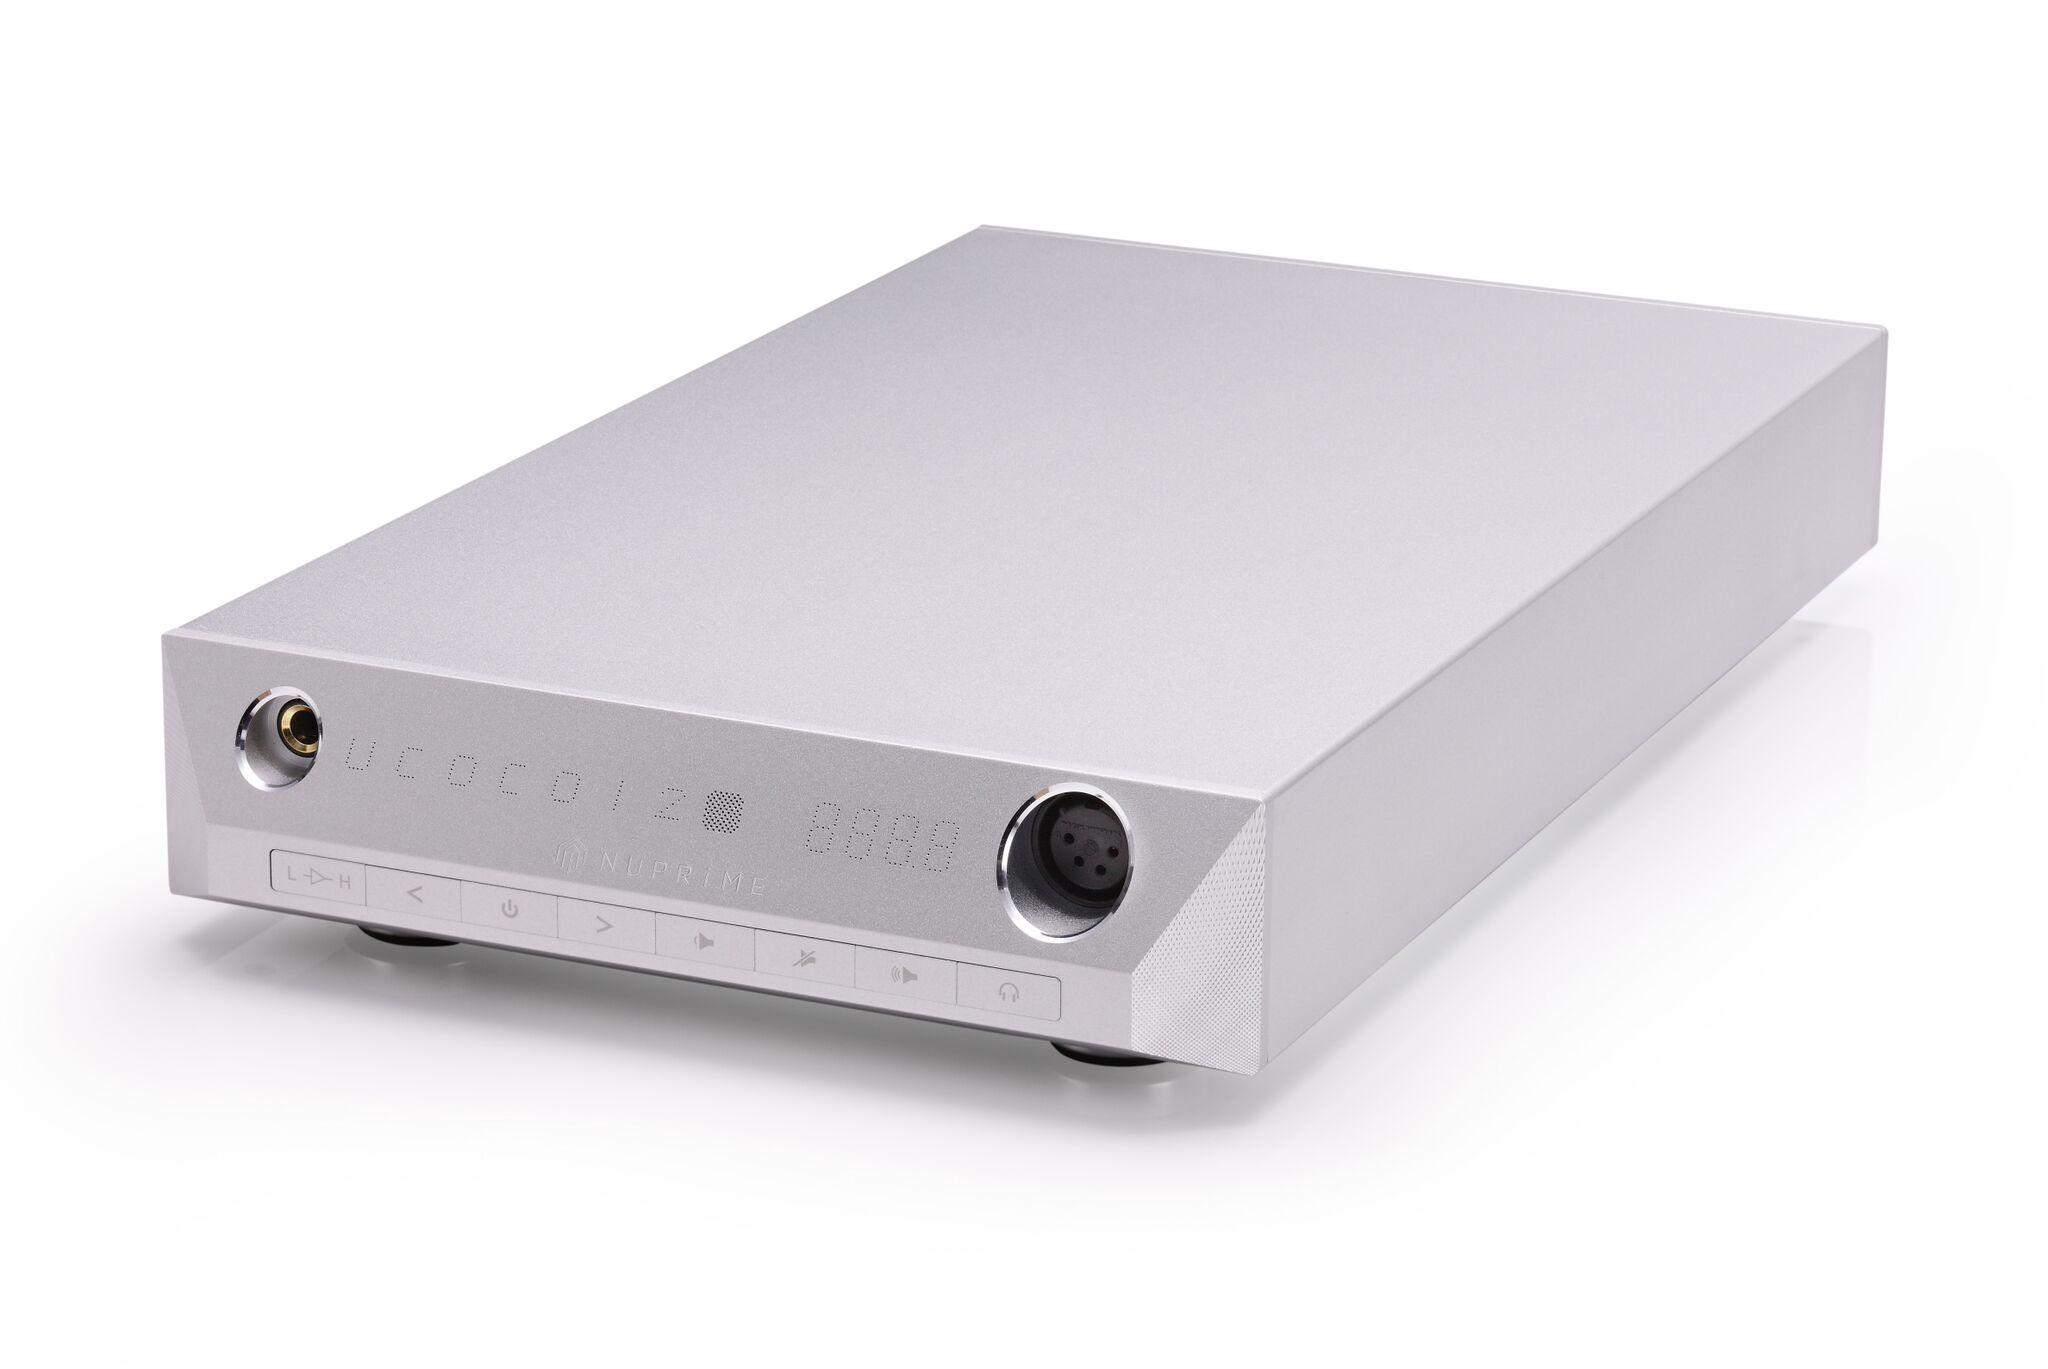 DAC10HSilver_2.JPG Audio, 10 things, Home audio